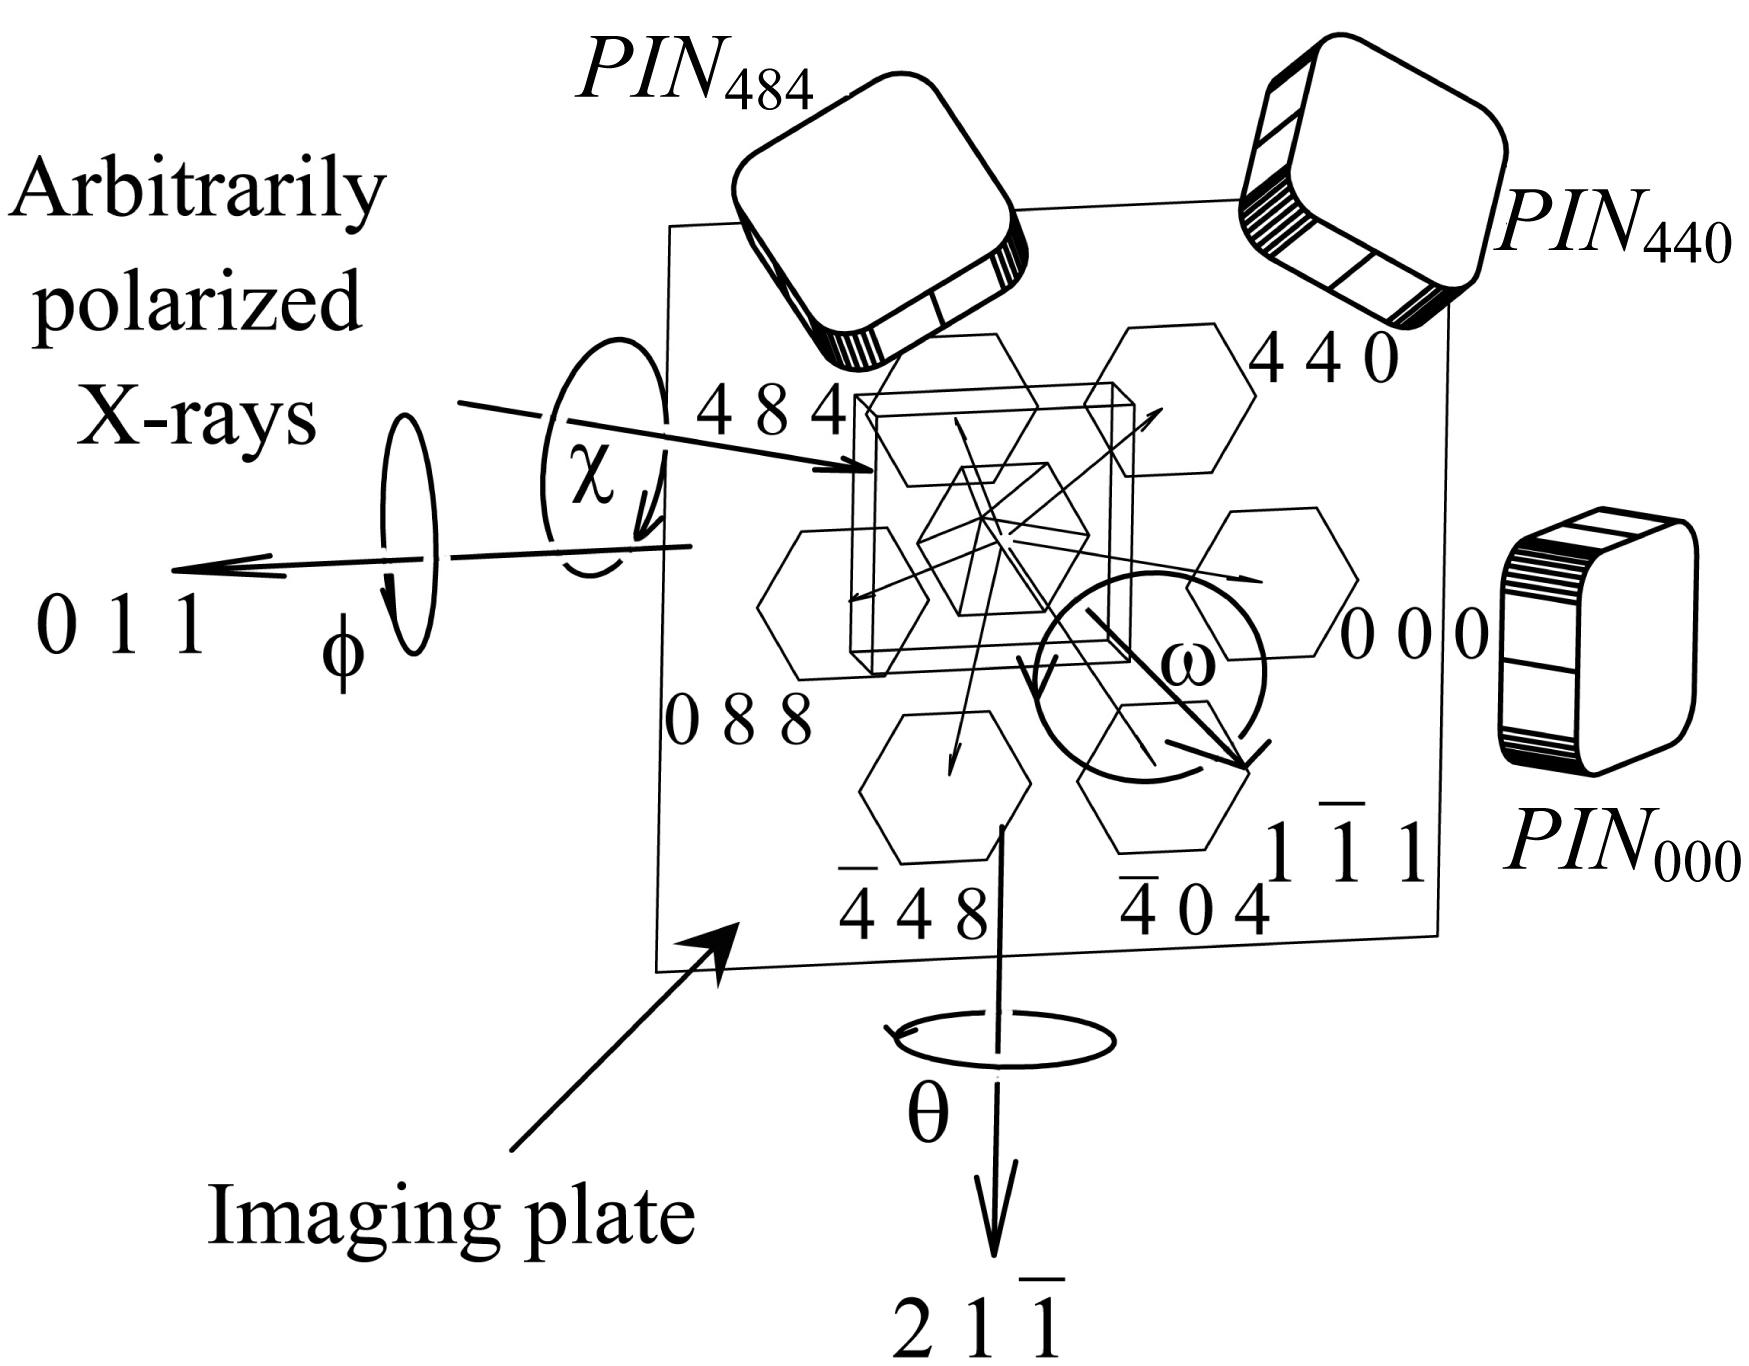 X Ray N Beam Takagi Taupin Dynamical Theory And N Beam